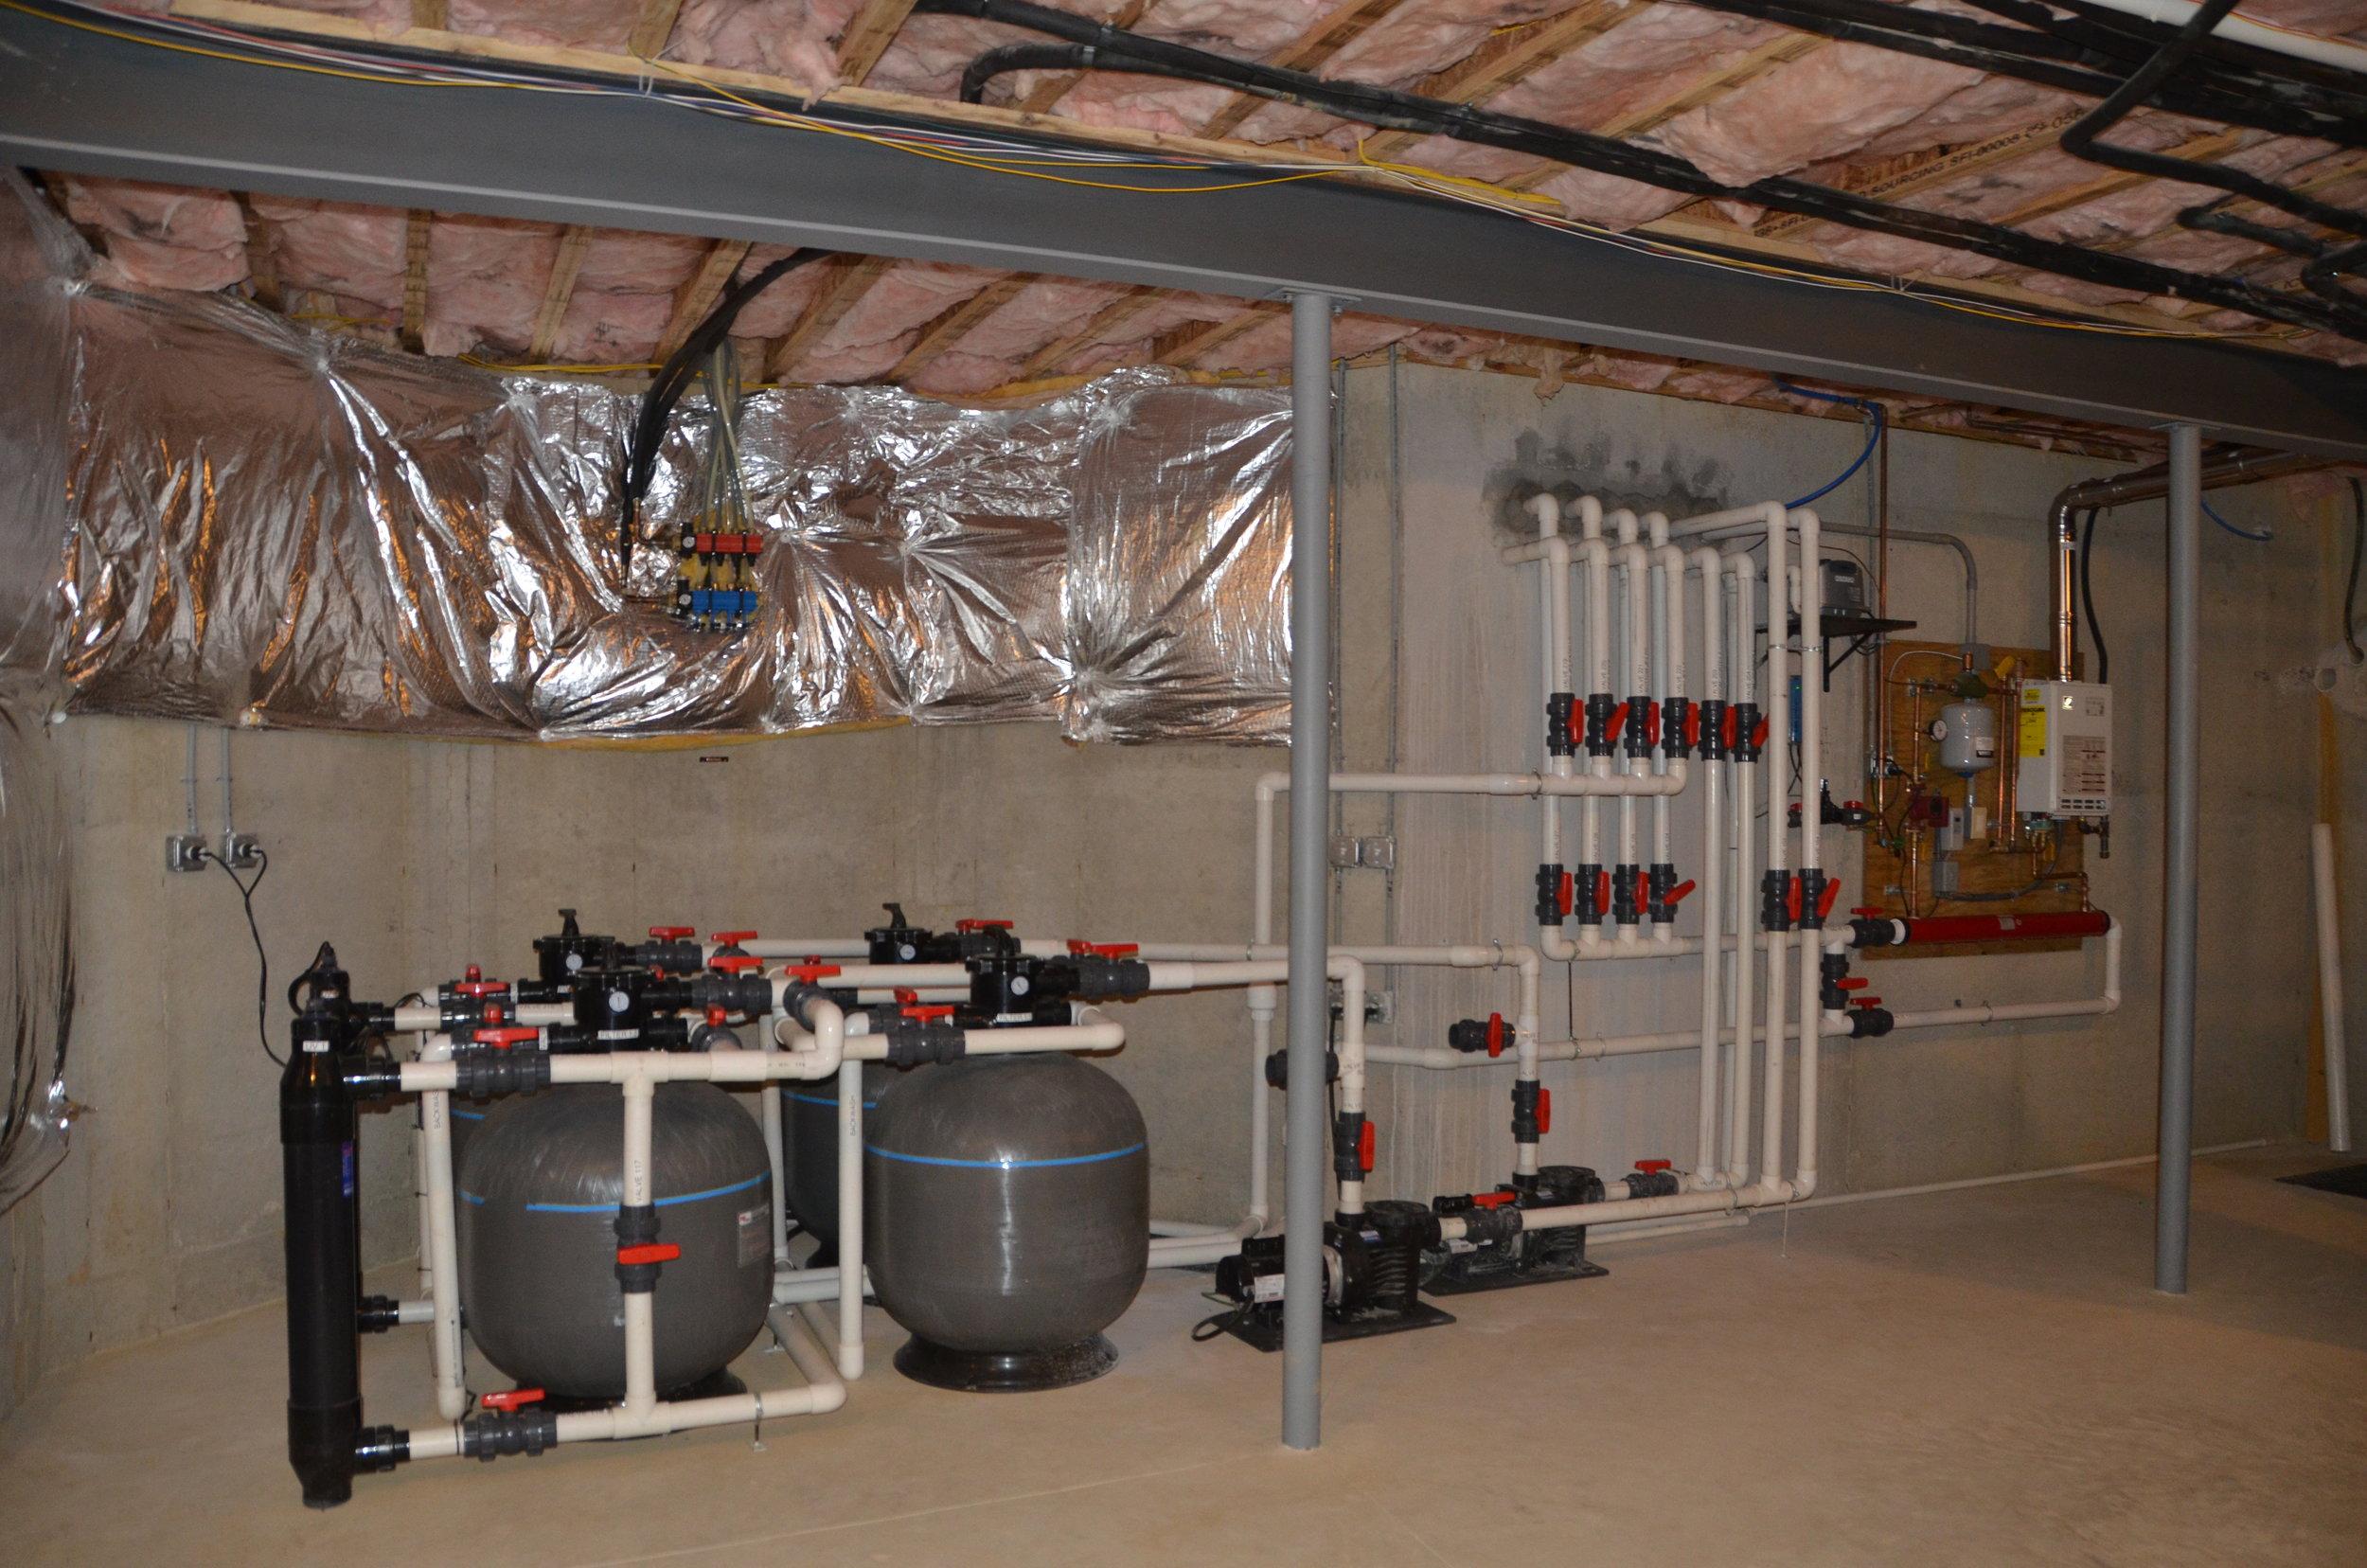 Maintenance_vault_pond plumbing_custom filtration_05.JPG